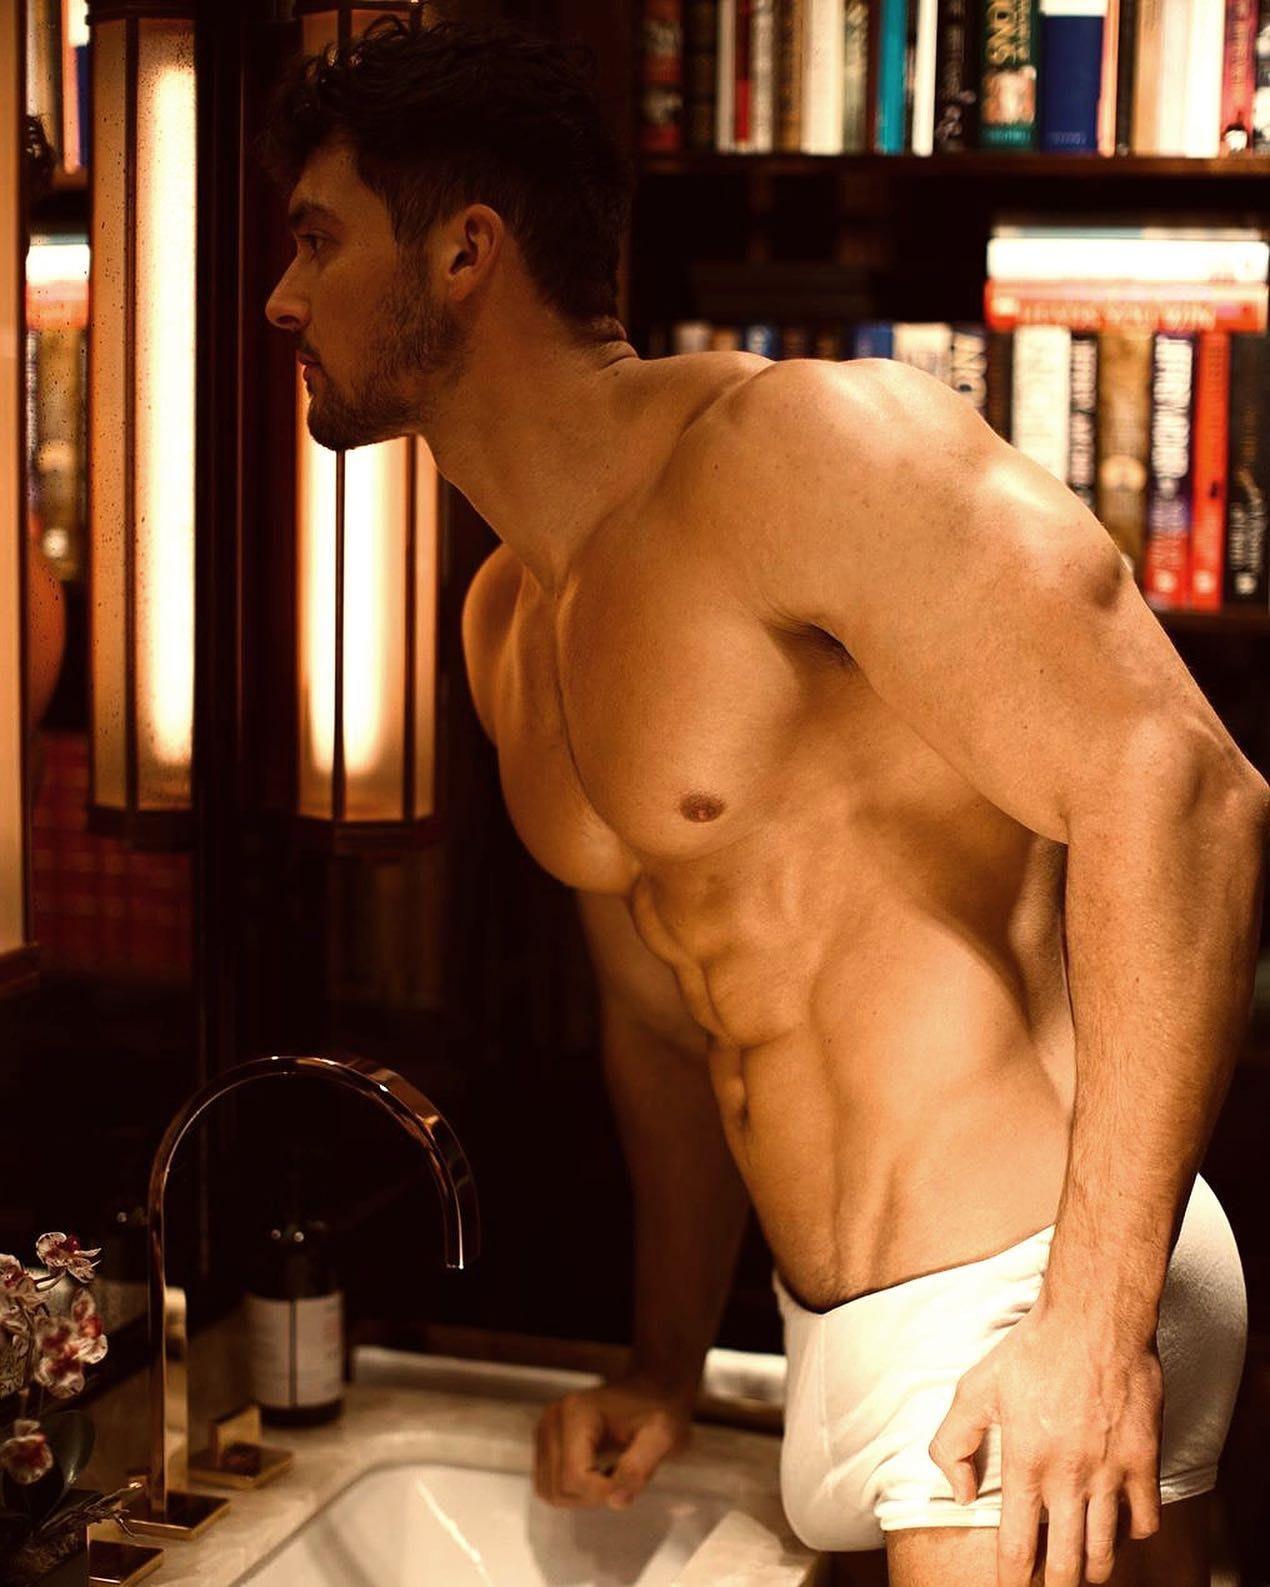 #joshwatson #men #muscular #underwear #bulge